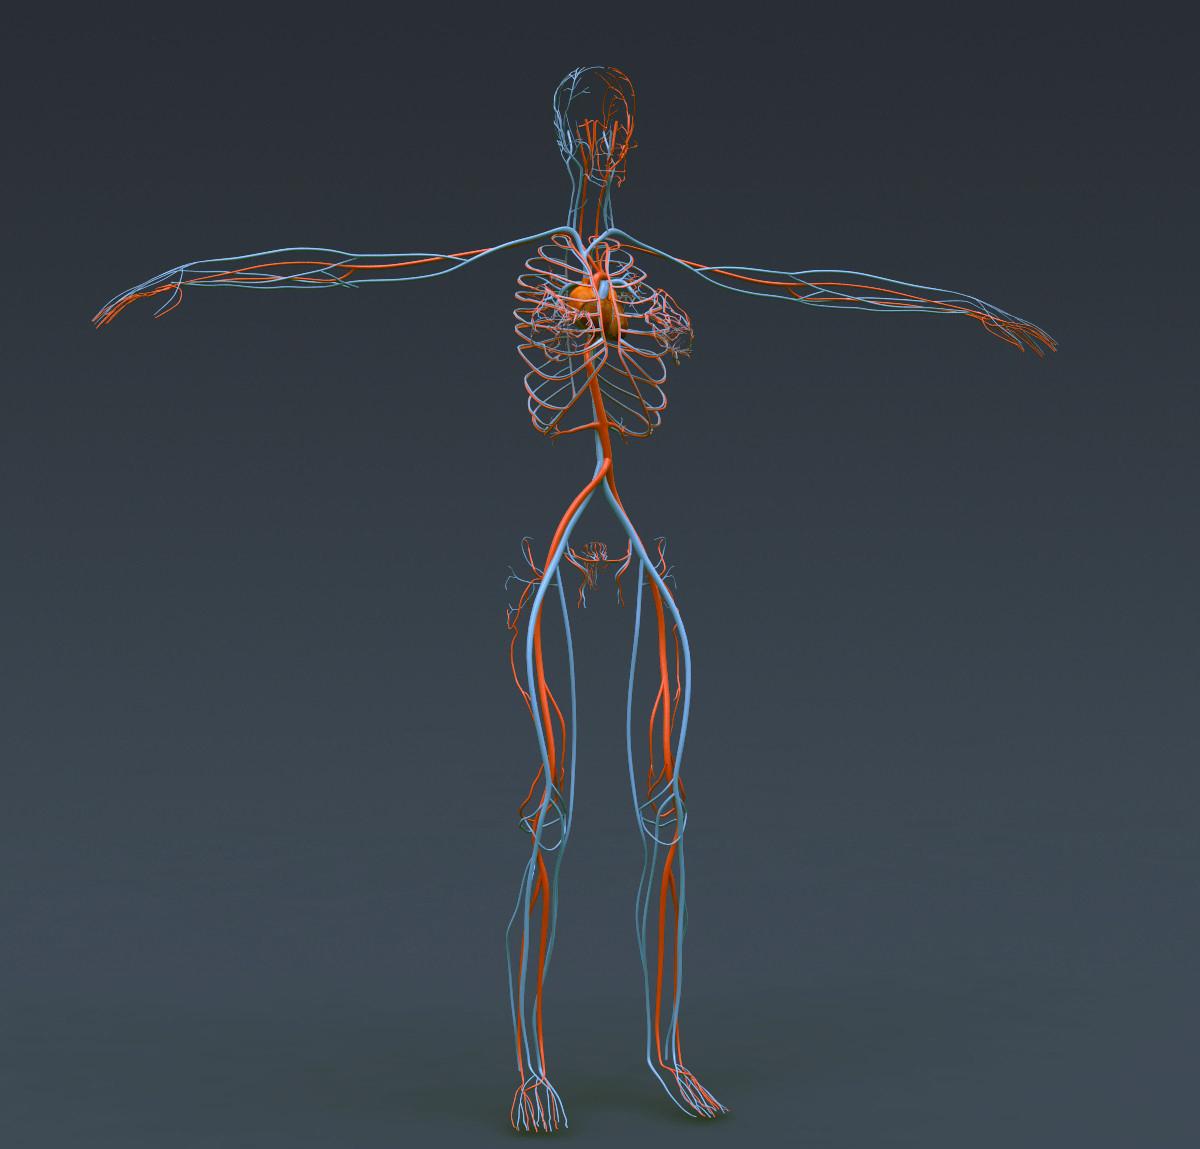 Female anatomy live model 2493675 - togelmaya.info